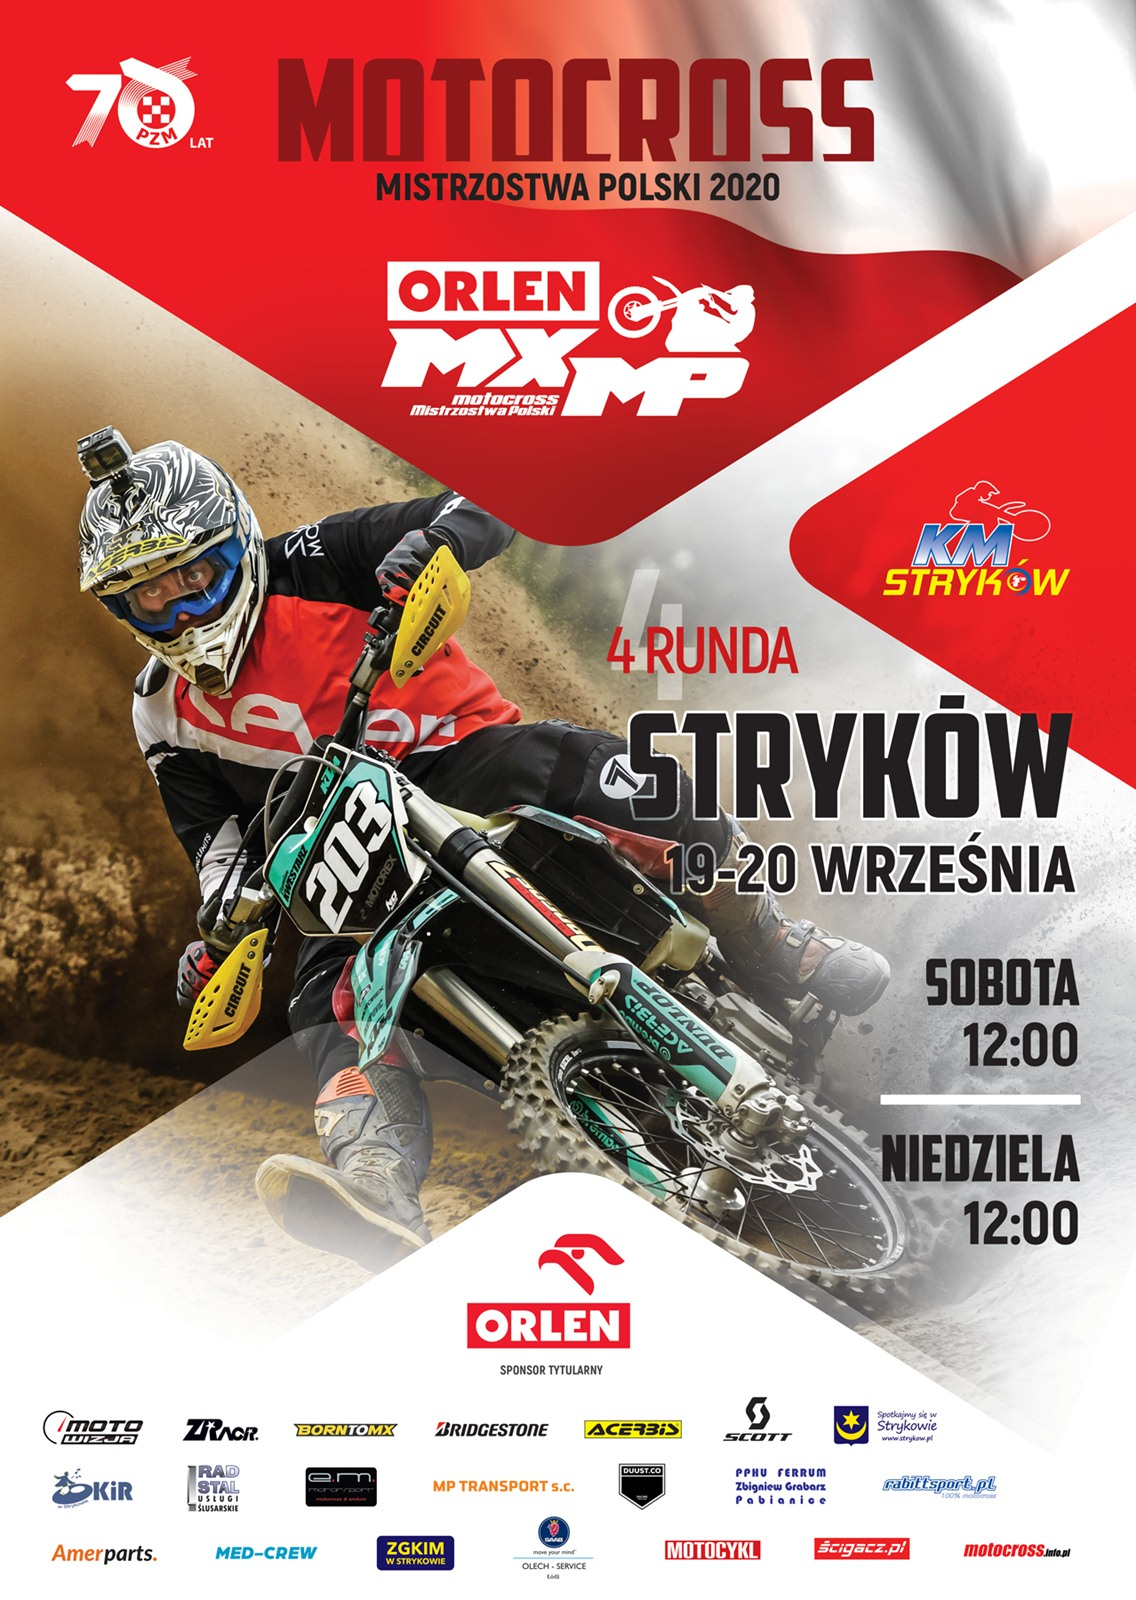 ORLEN MXMP Stryków 2020